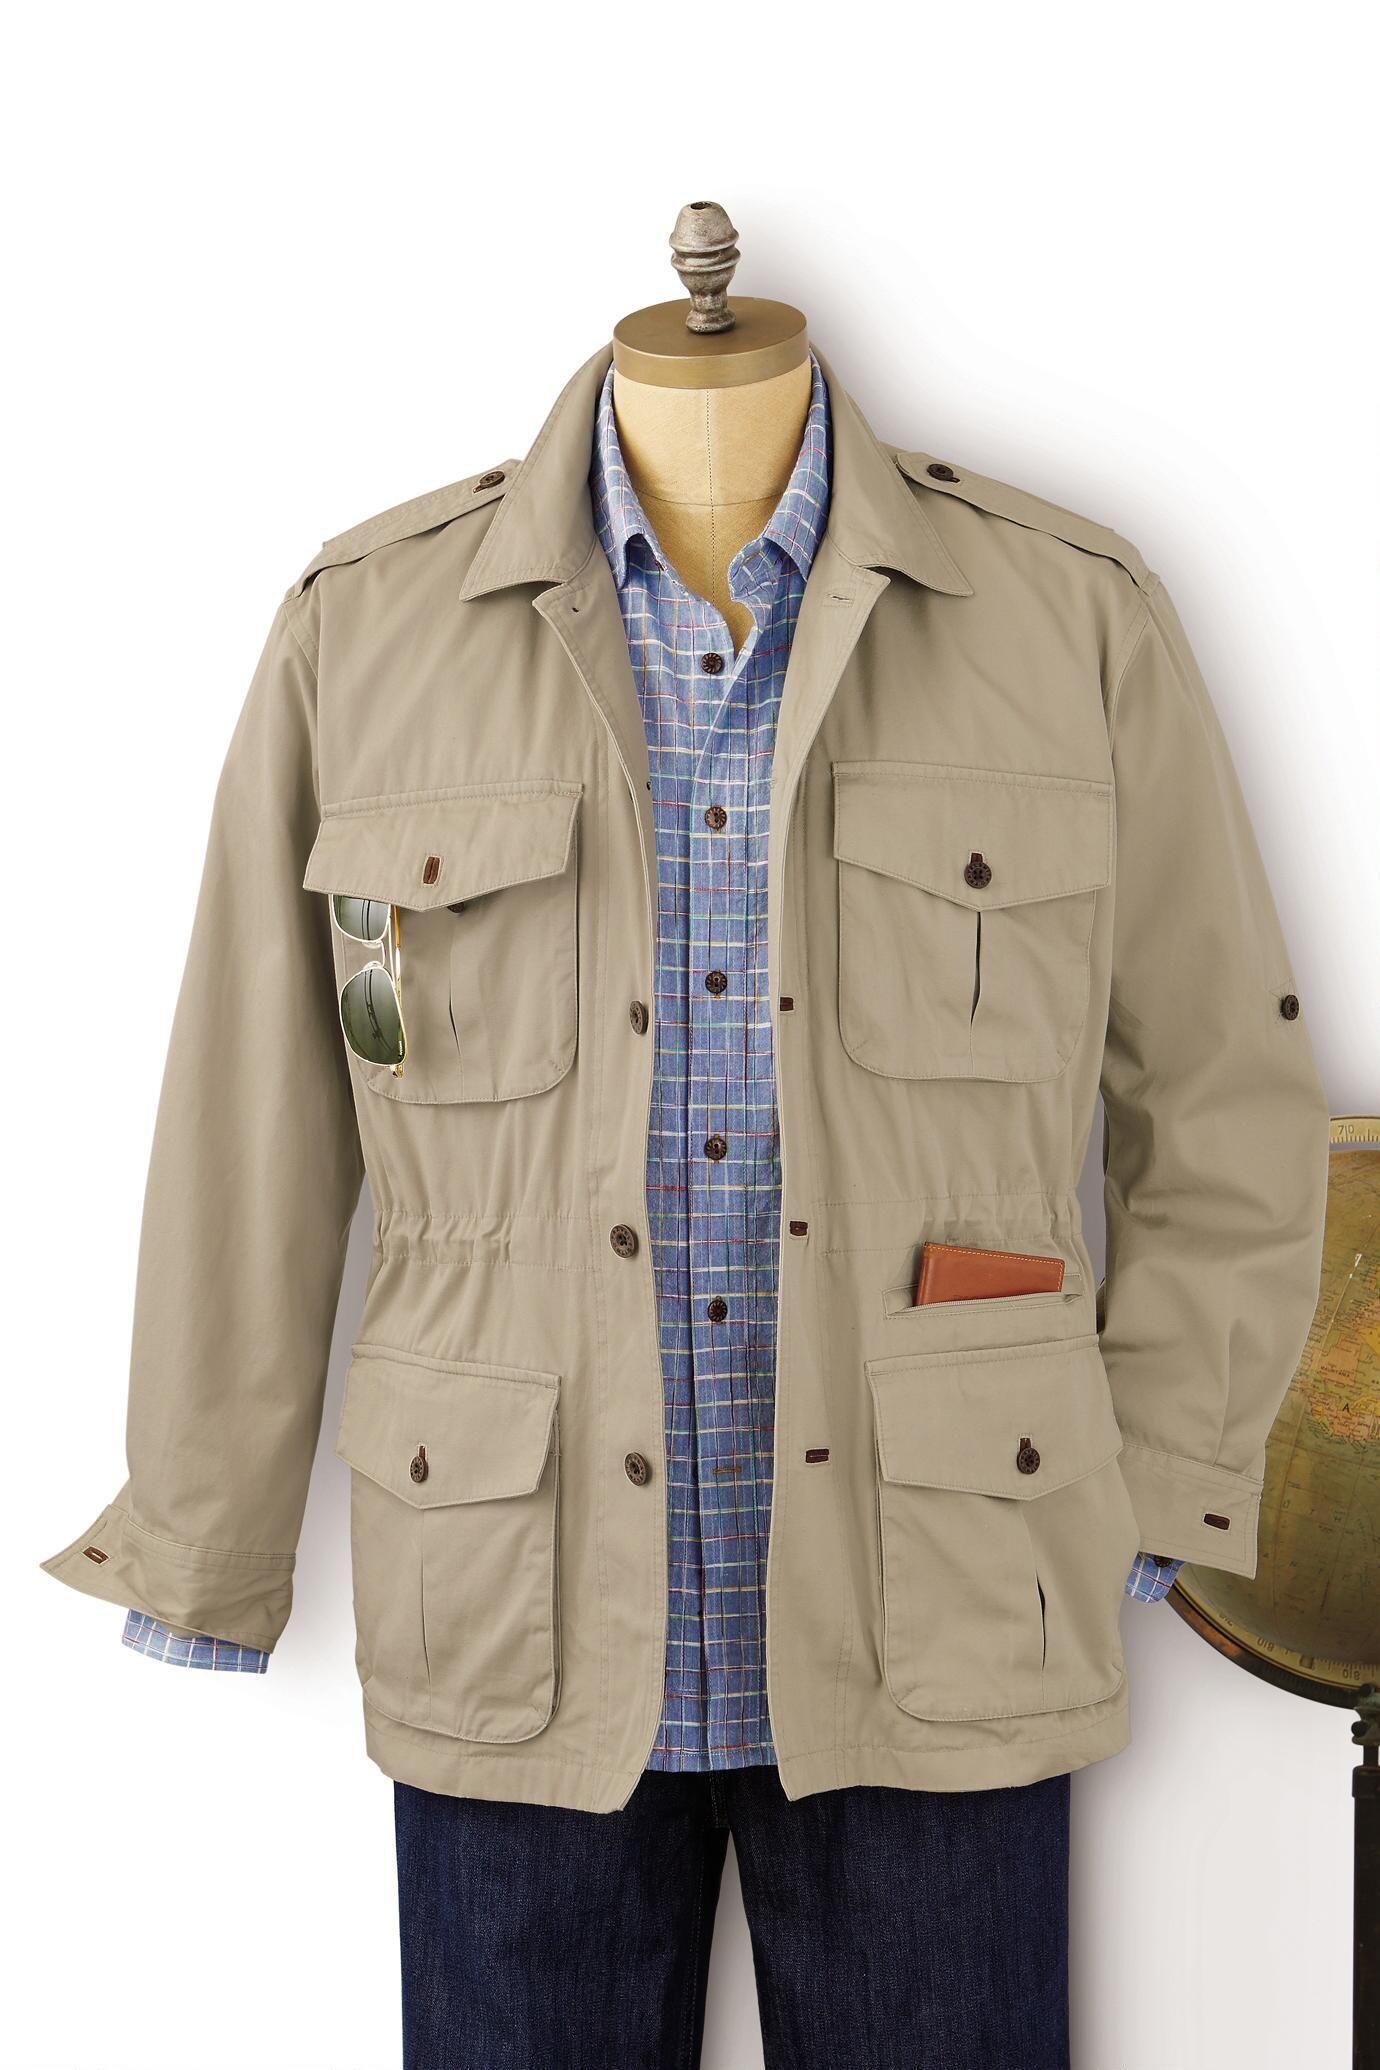 0478ee1962 Bush Poplin Safari Jacket: #Travelsmith $139.00 - $149.00   Abba in ...